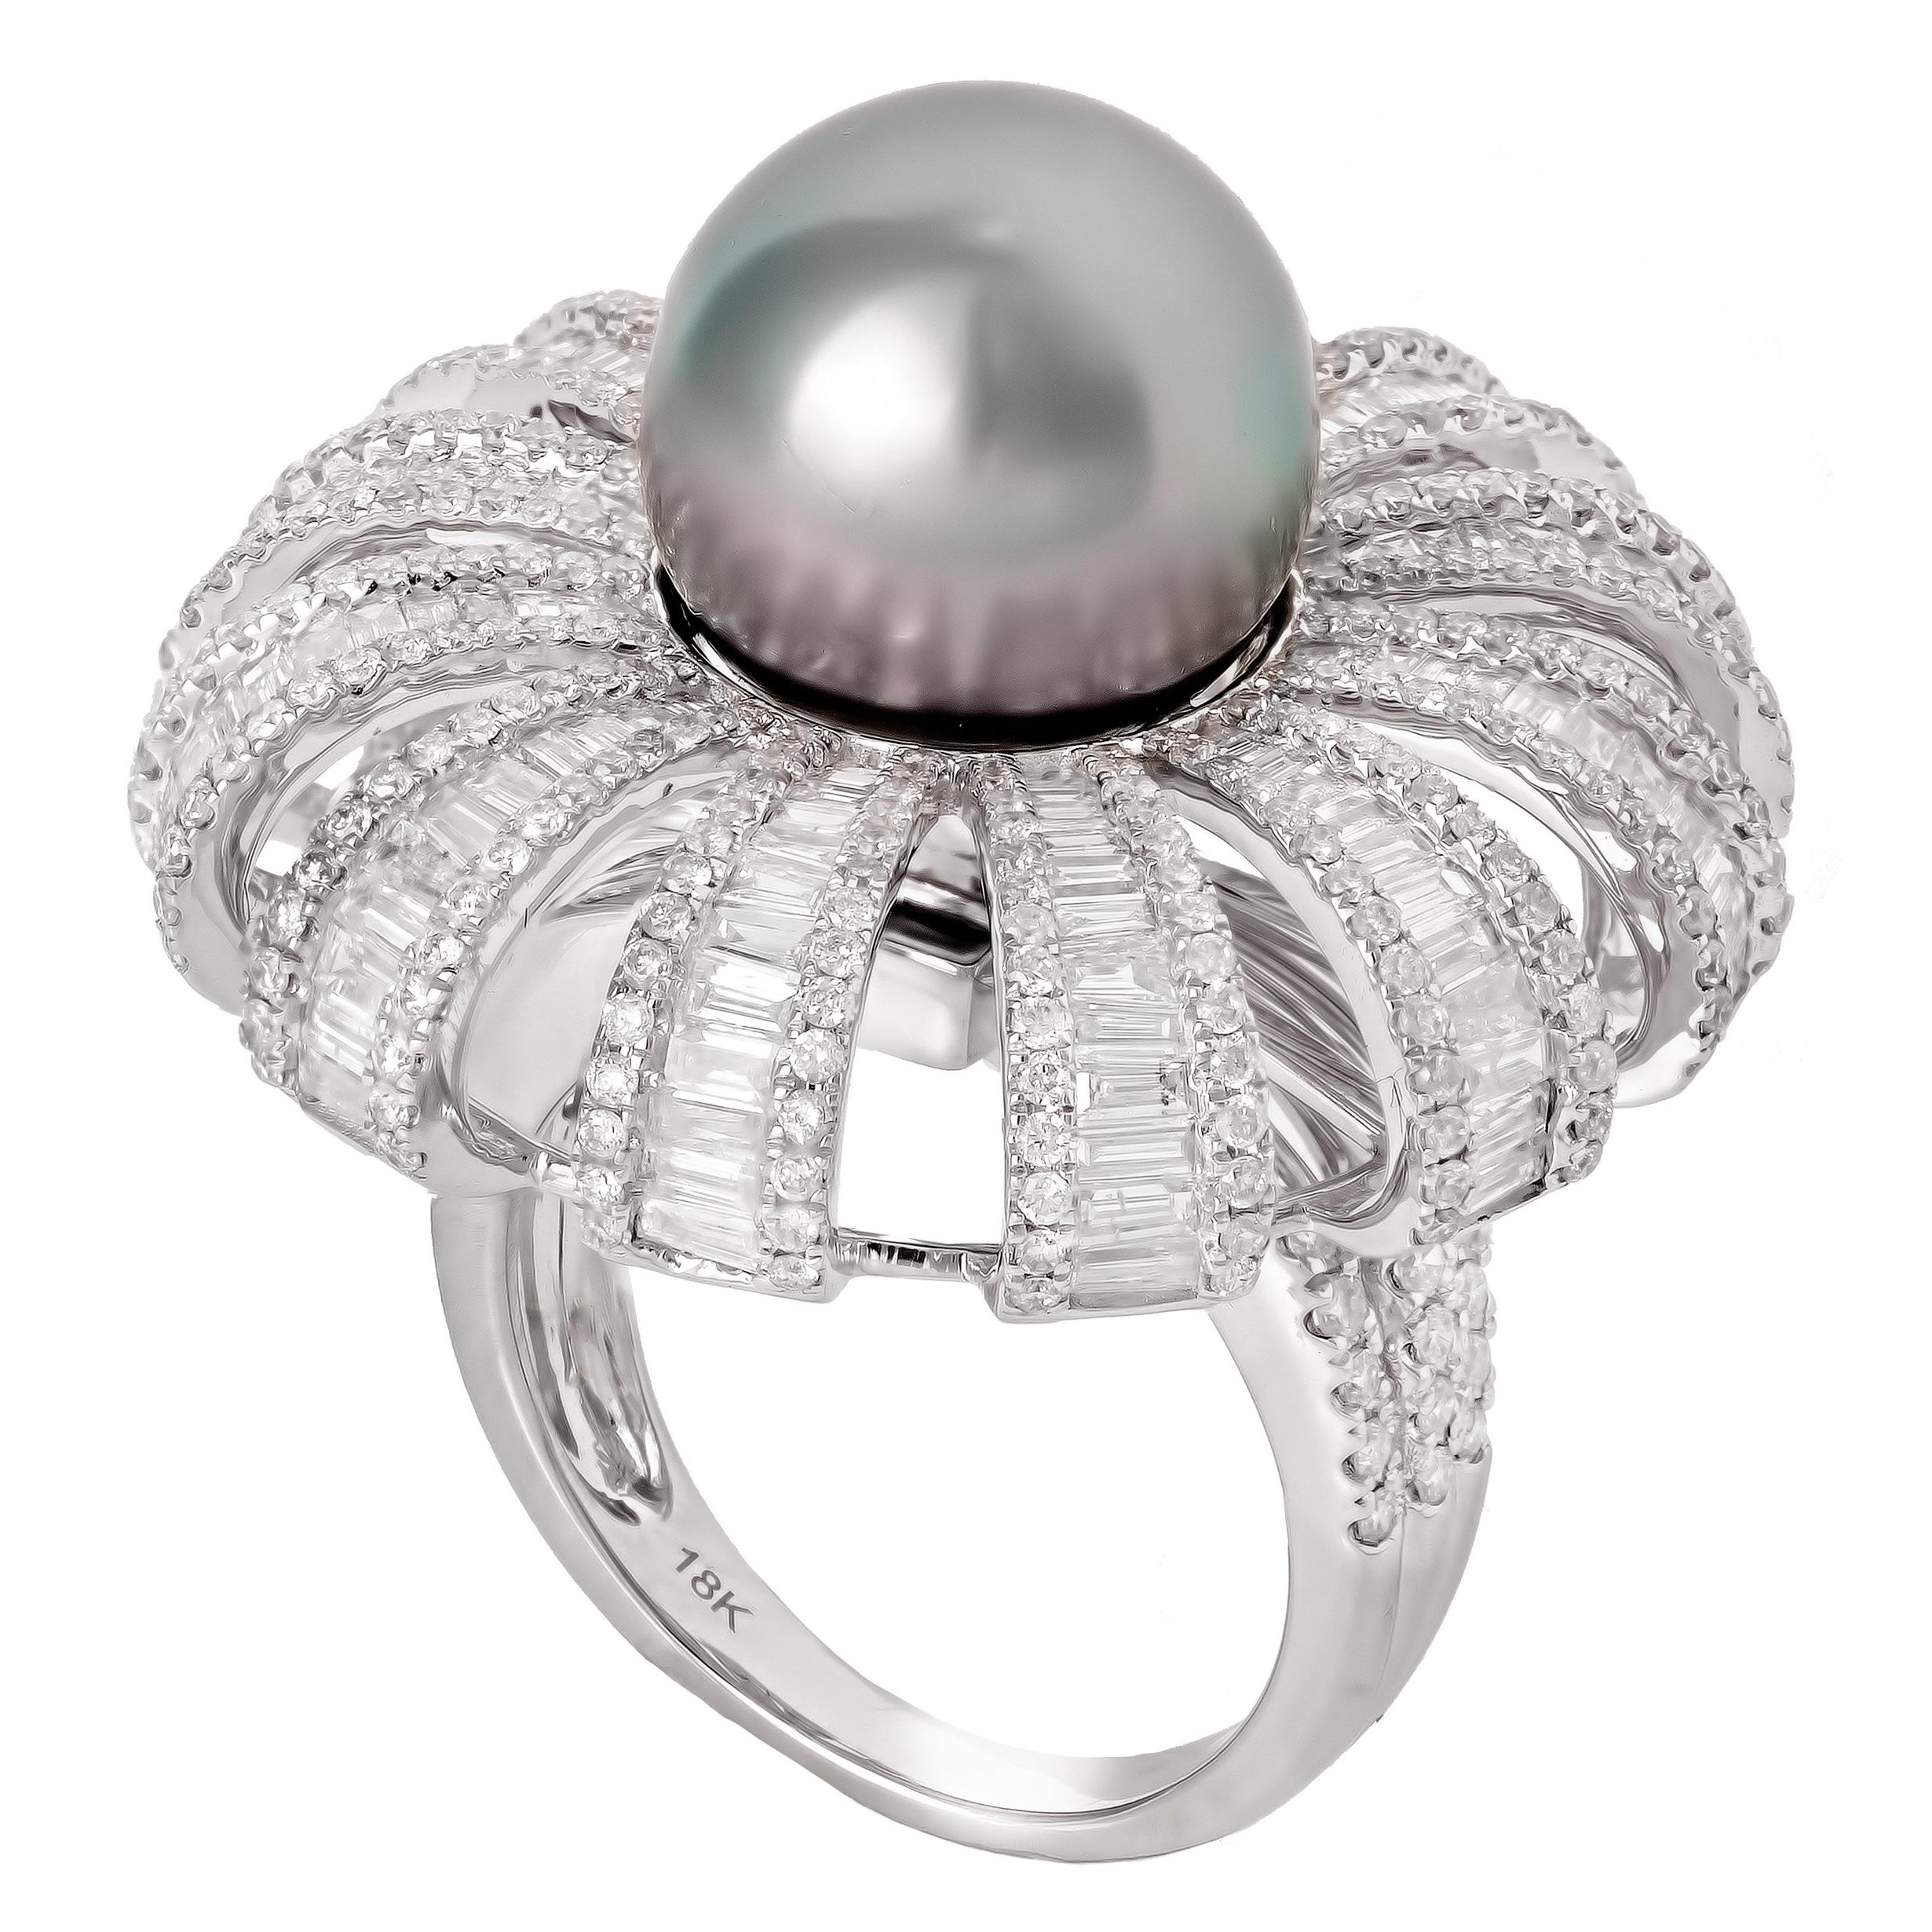 Stones:   -White Diamond Round Full Cut  -Diamond Baguette  -Pearl Tahitian